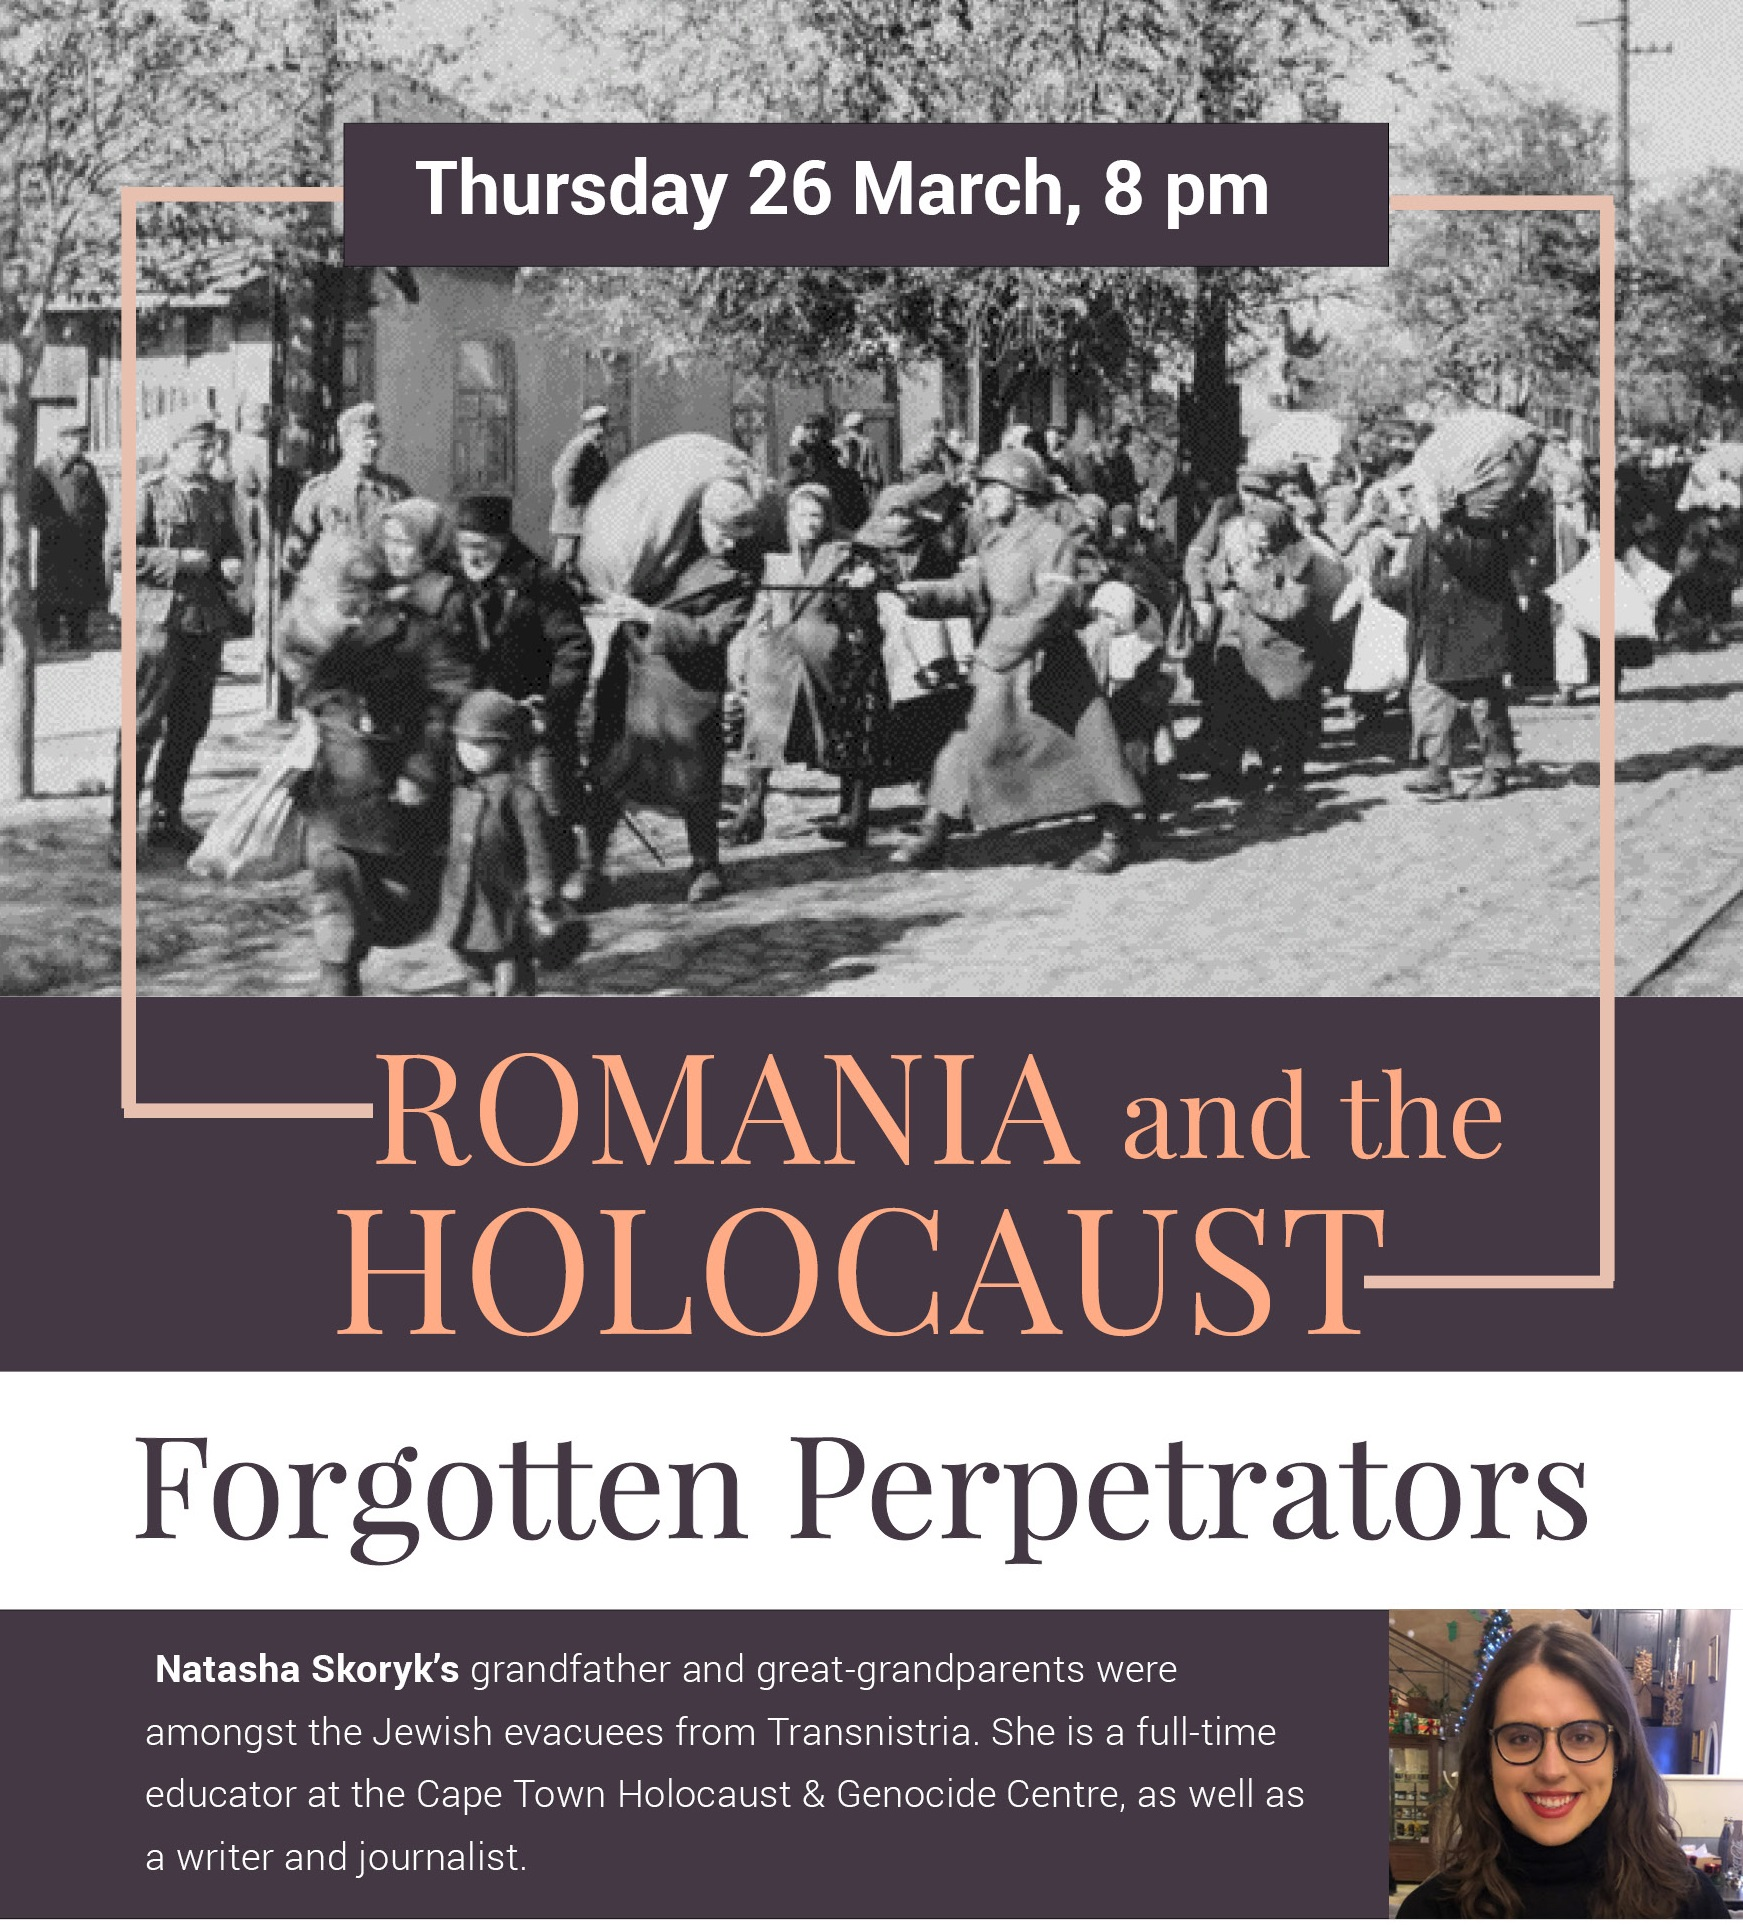 Natasha_Skoryk-CTHGC-Romania-and-the-Holocaust